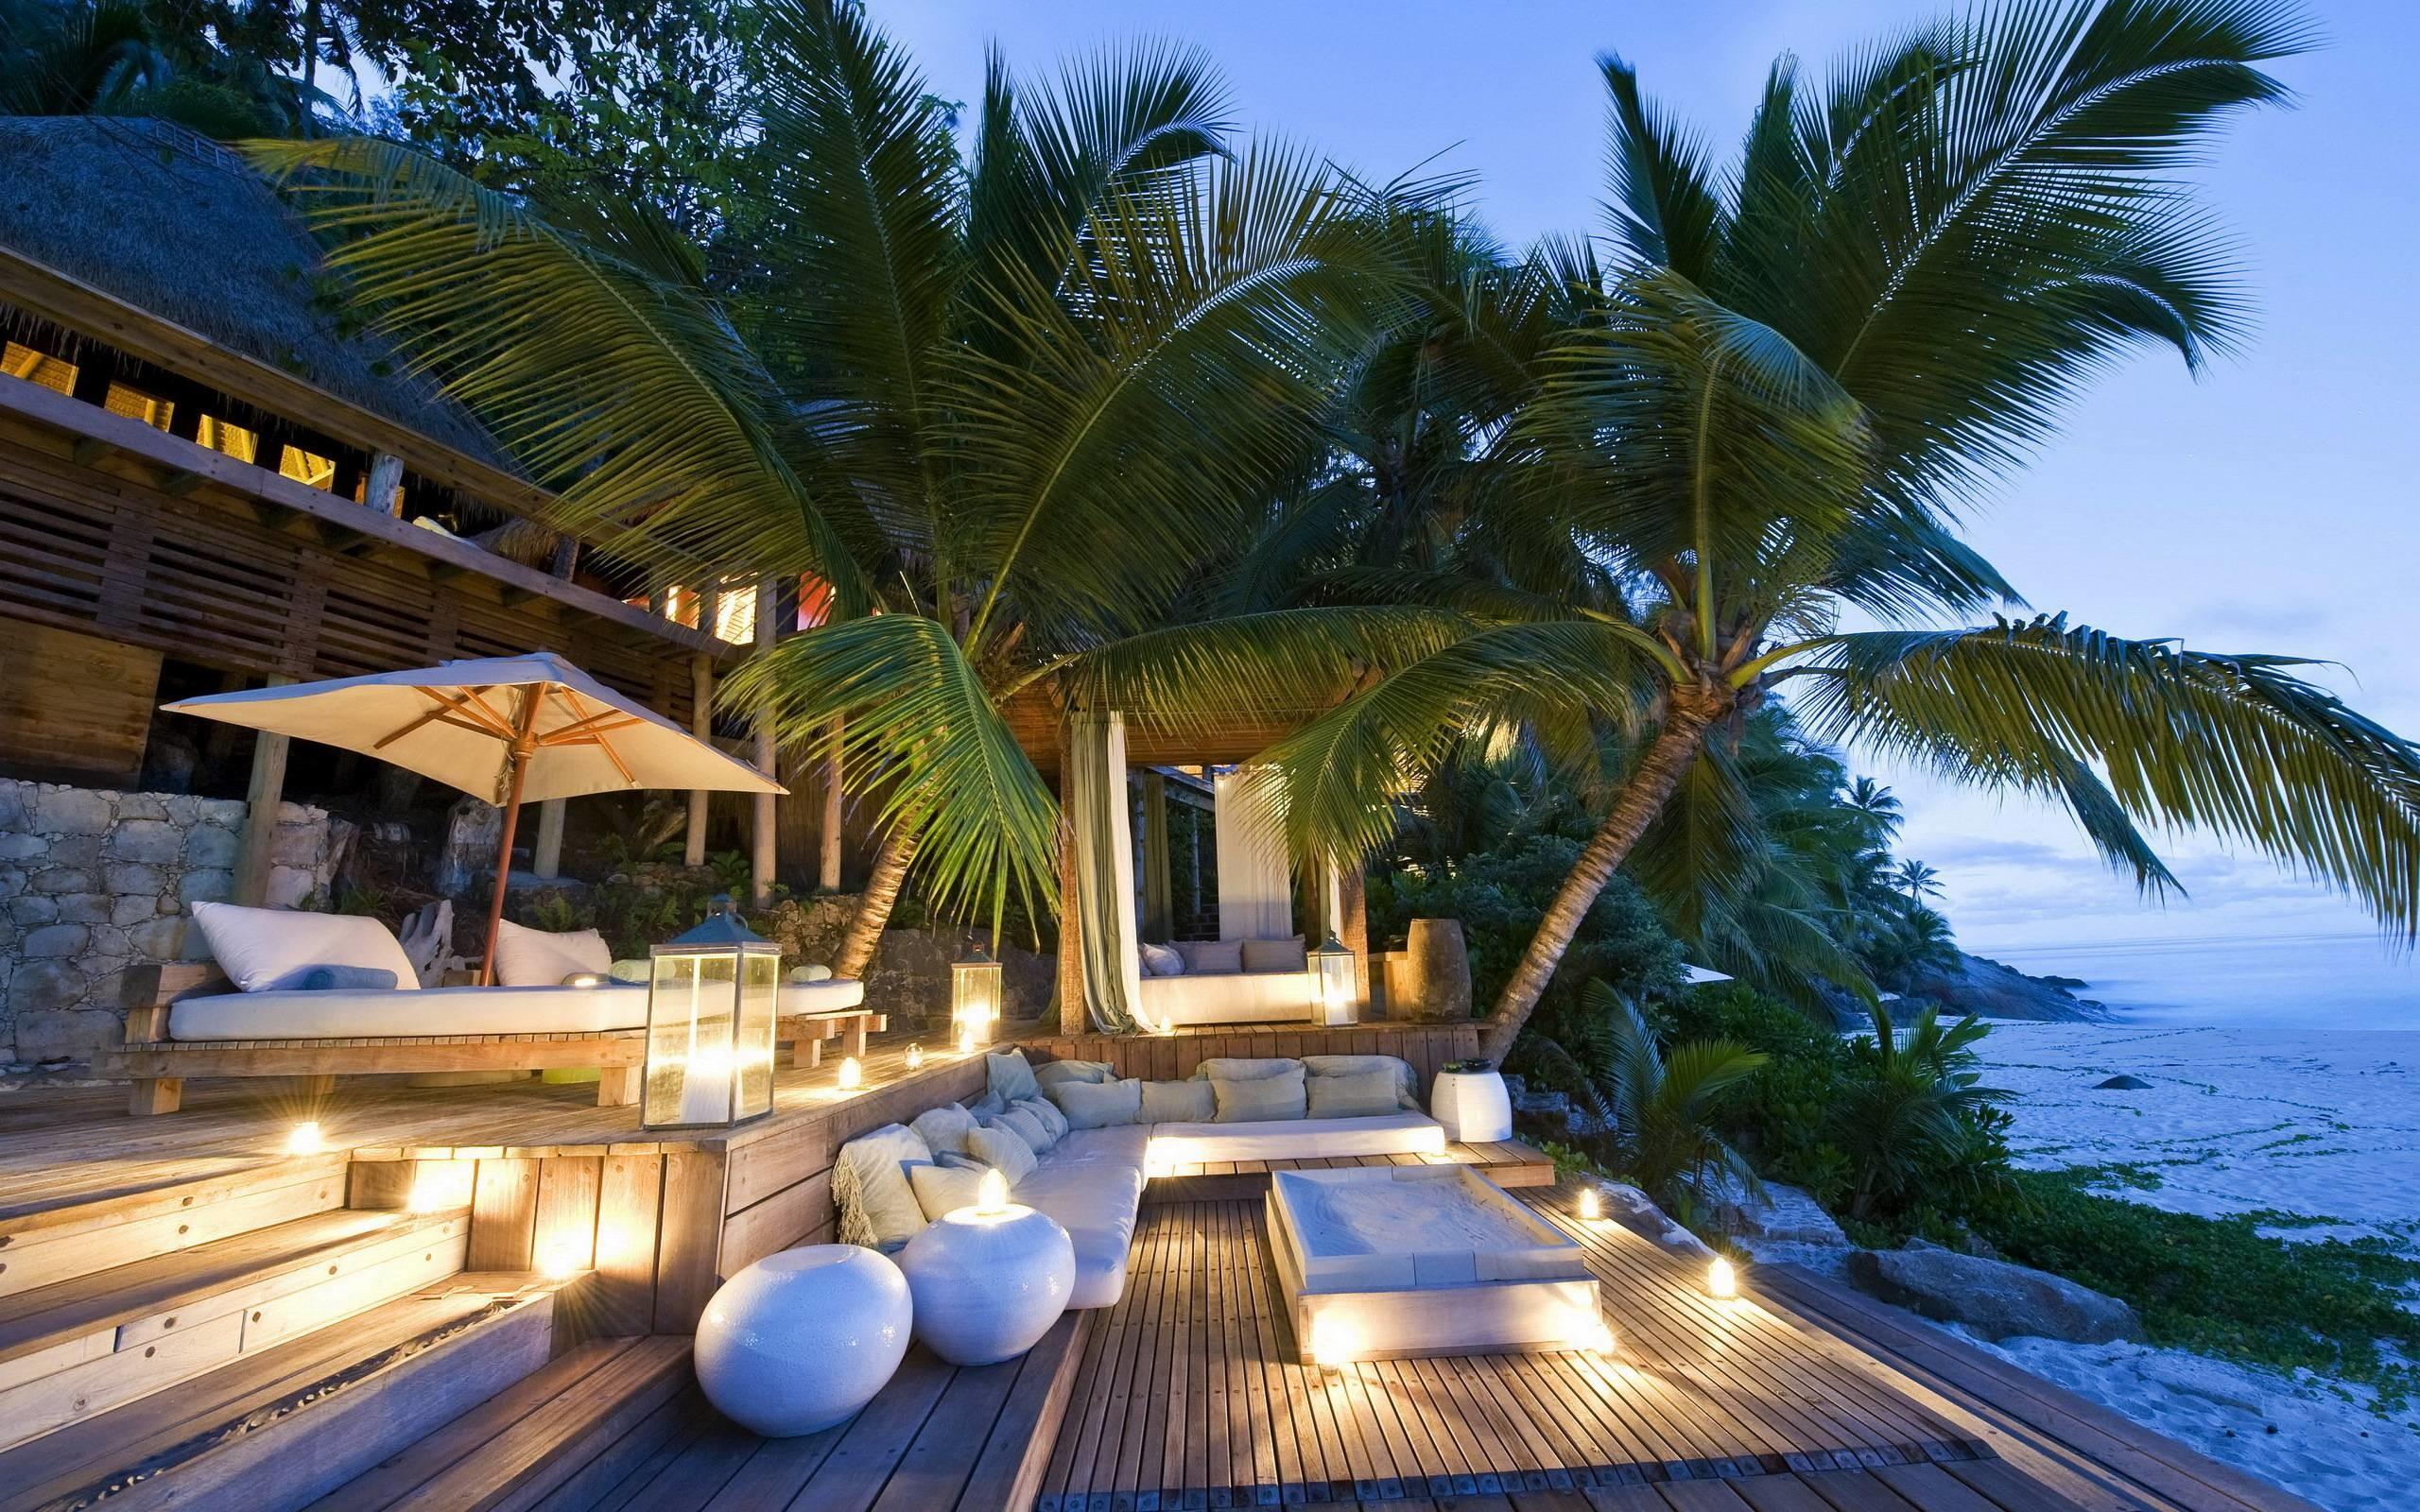 1003029-beach-house-wallpaper-2560x1600-download